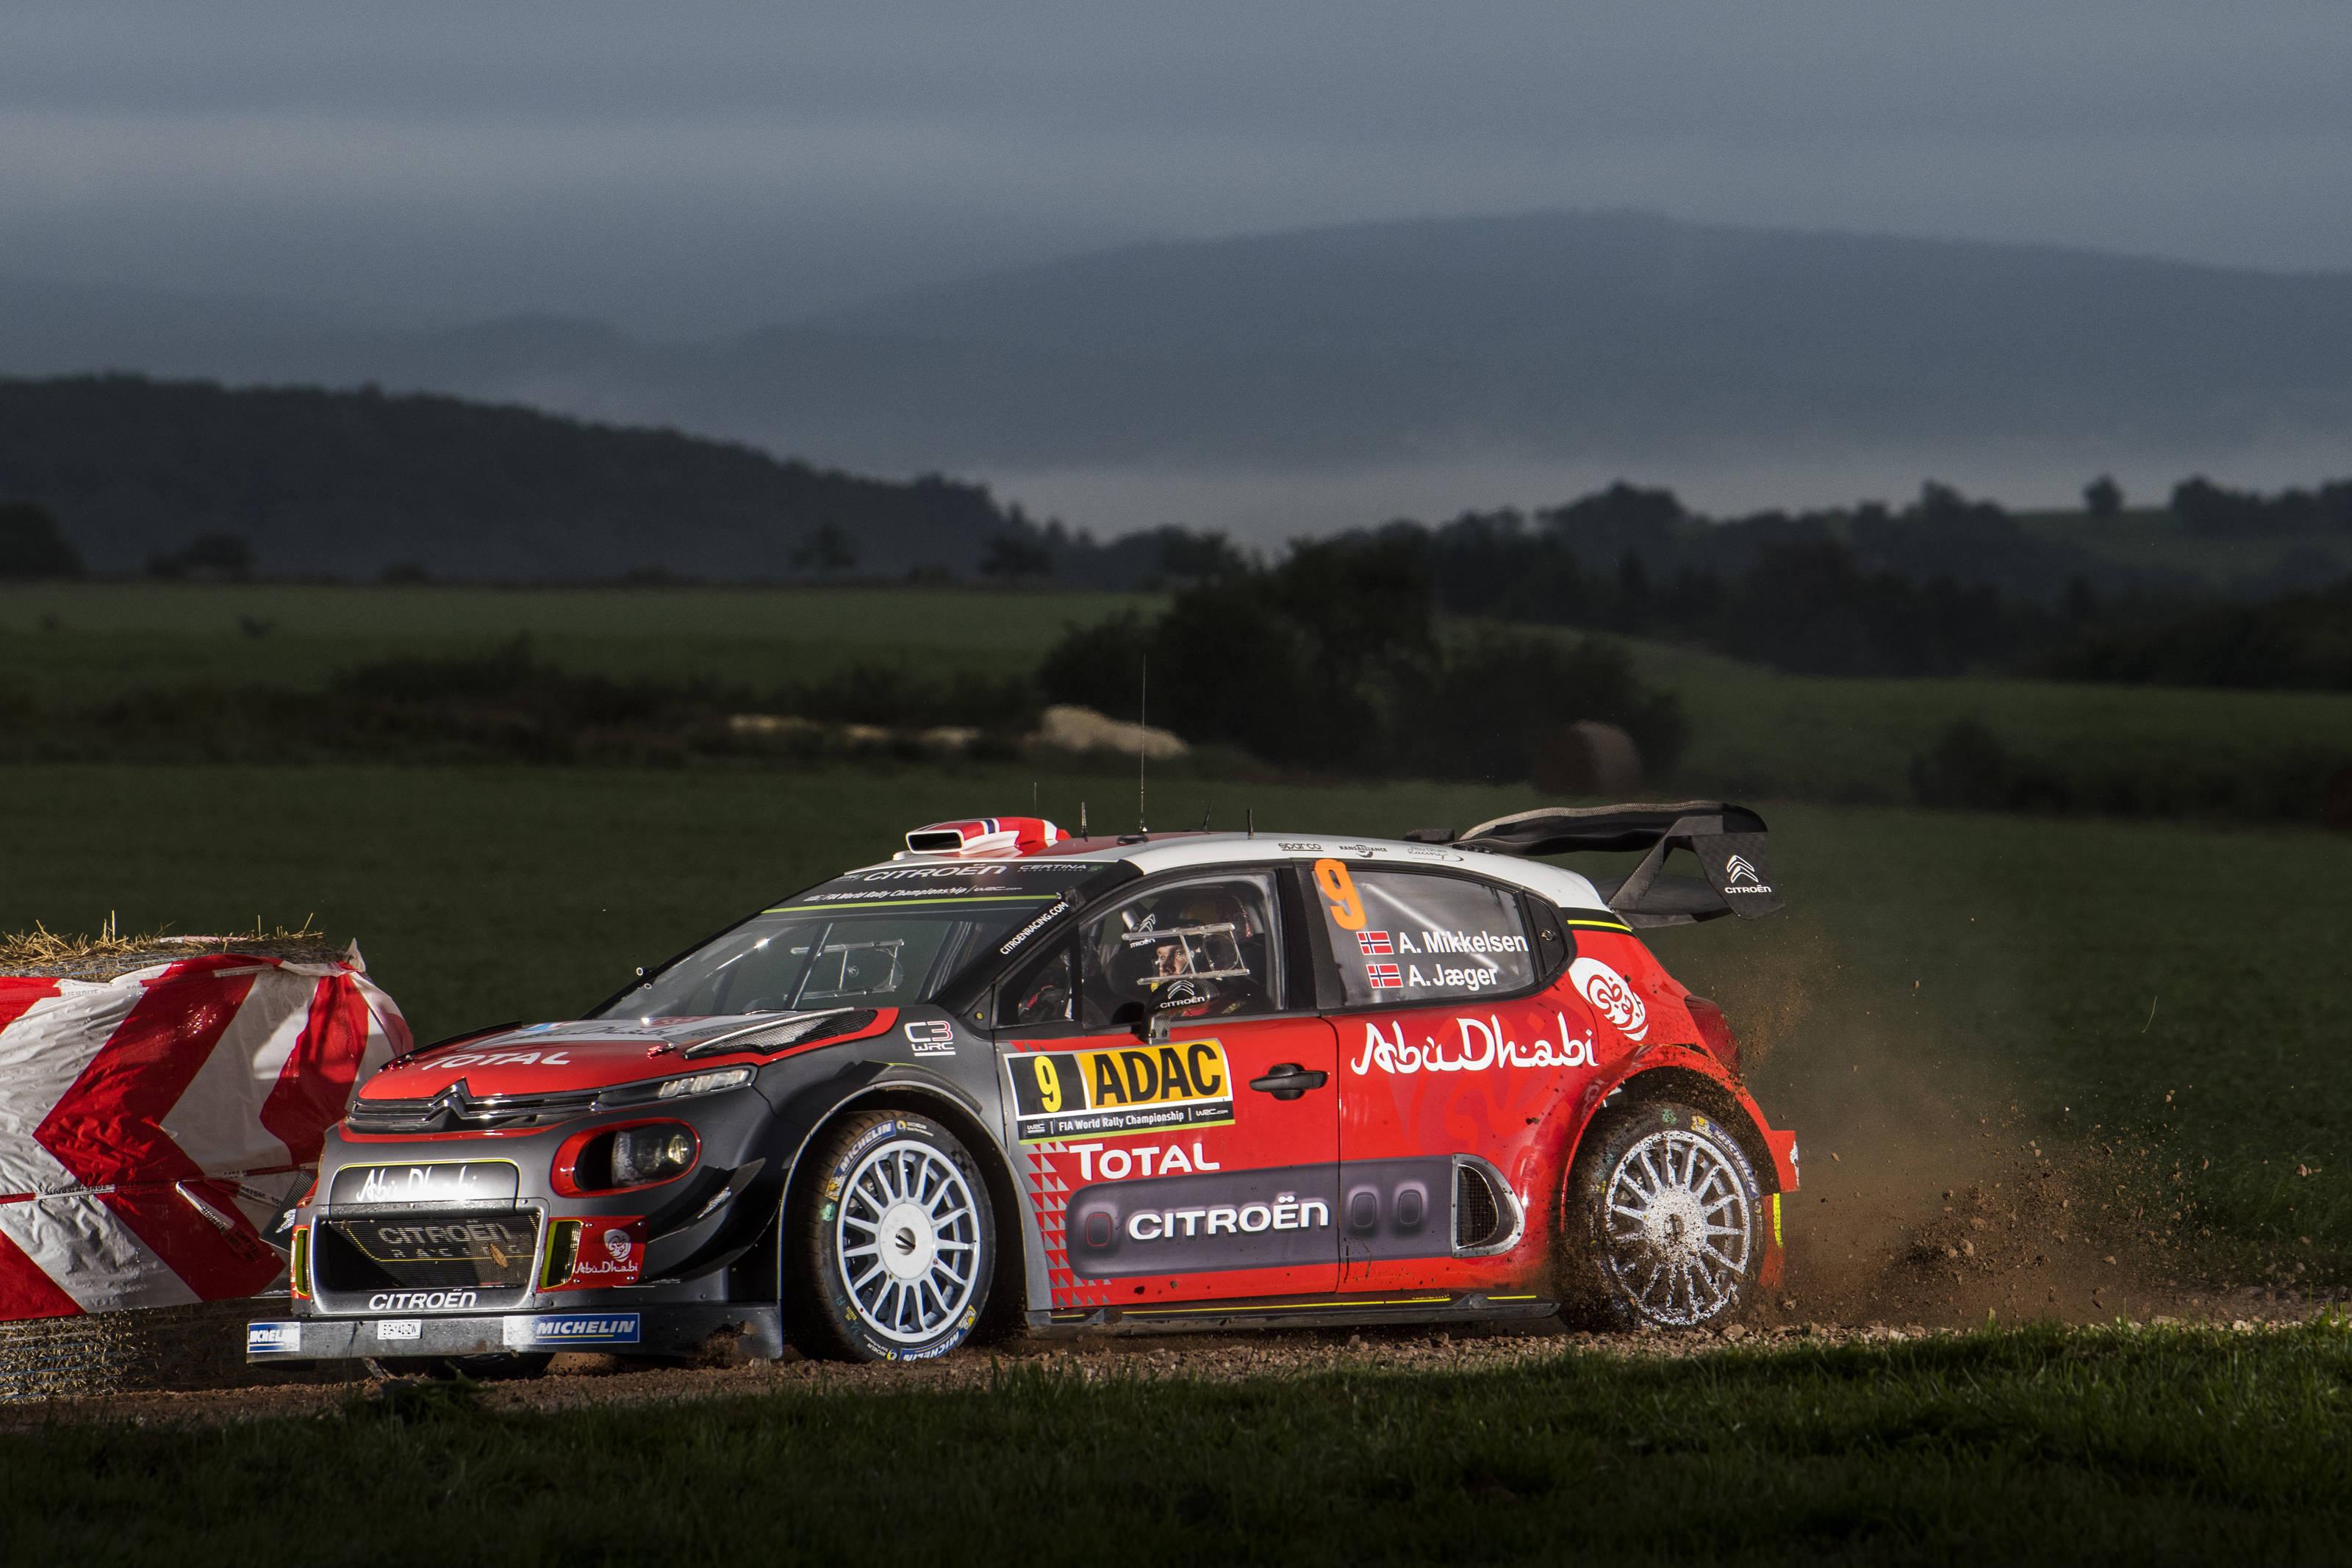 Citroen C3 Tyre Pressure >> FIA World Rally Championship / ADAC Rallye Deutschland / Tänak seals win - ASC - Action Sports ...